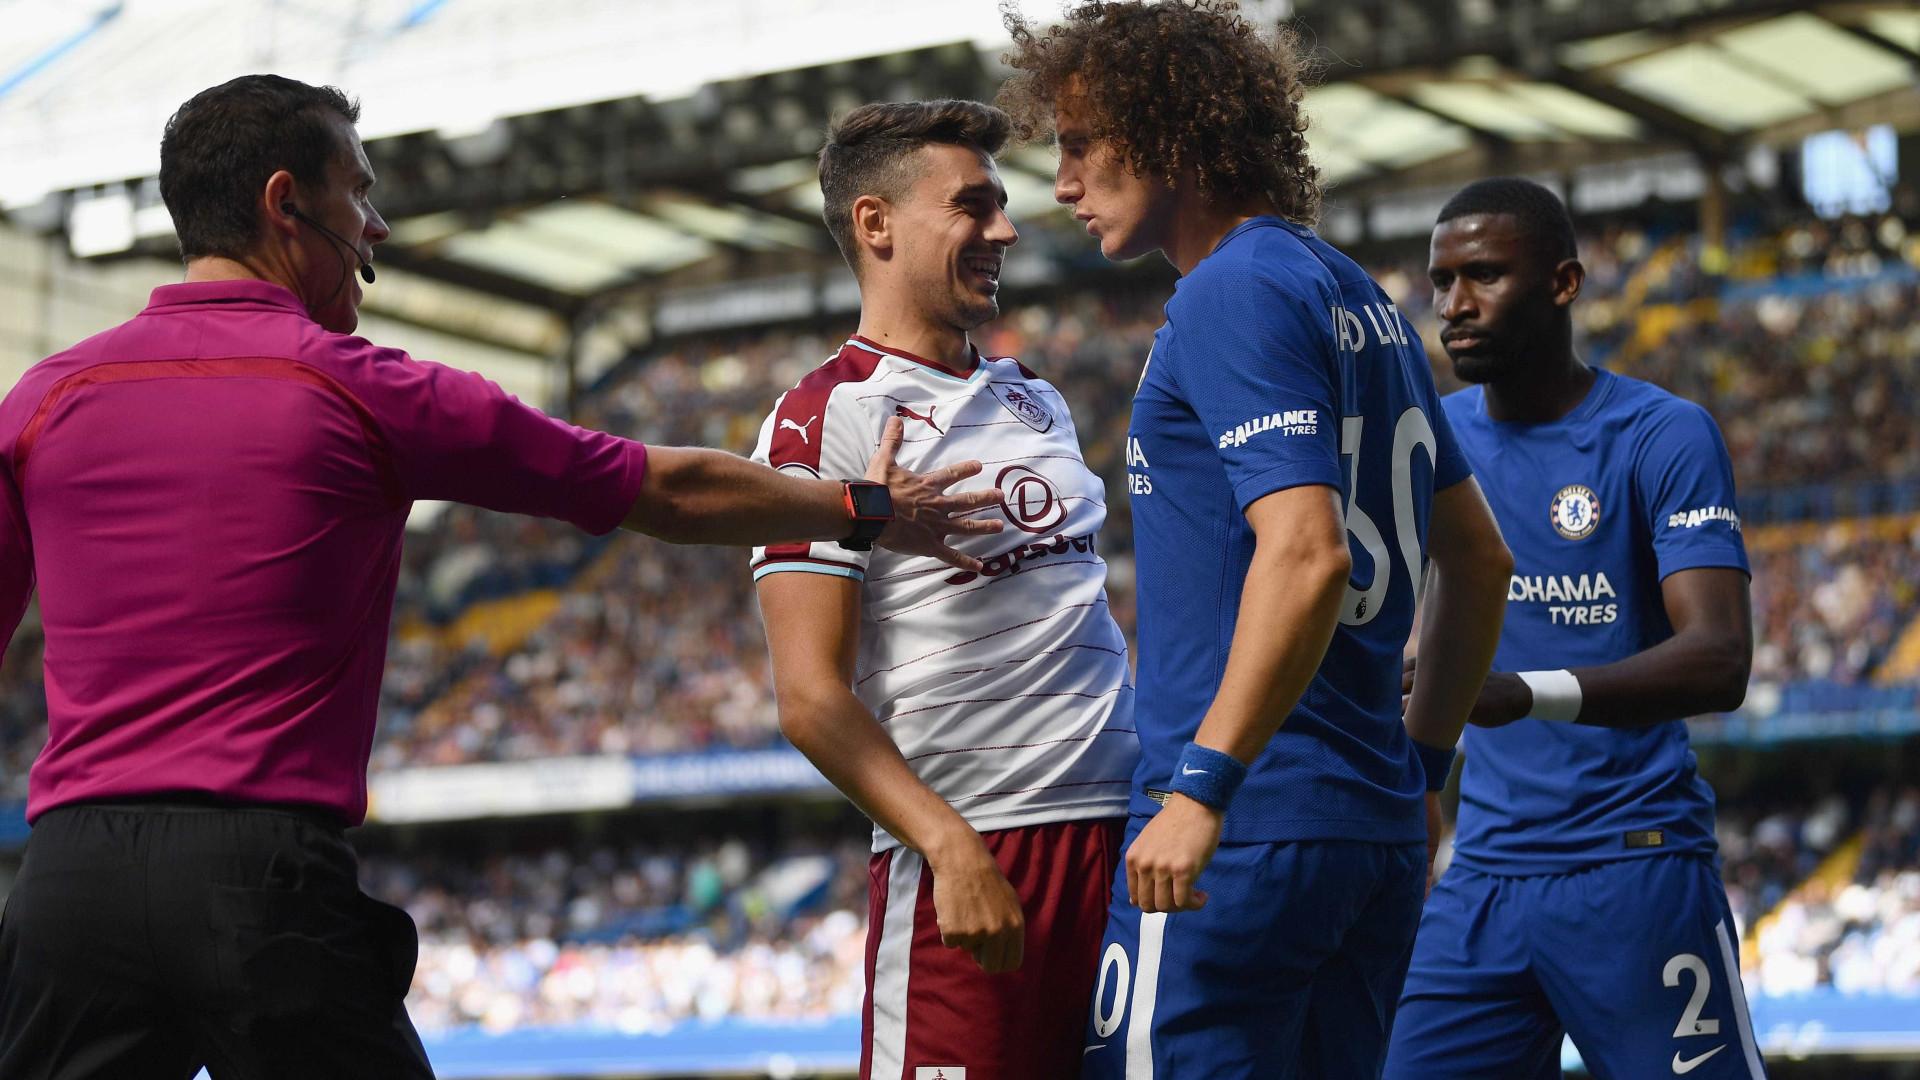 Burnley surpreende e derrota Chelsea no arranque do campeonato